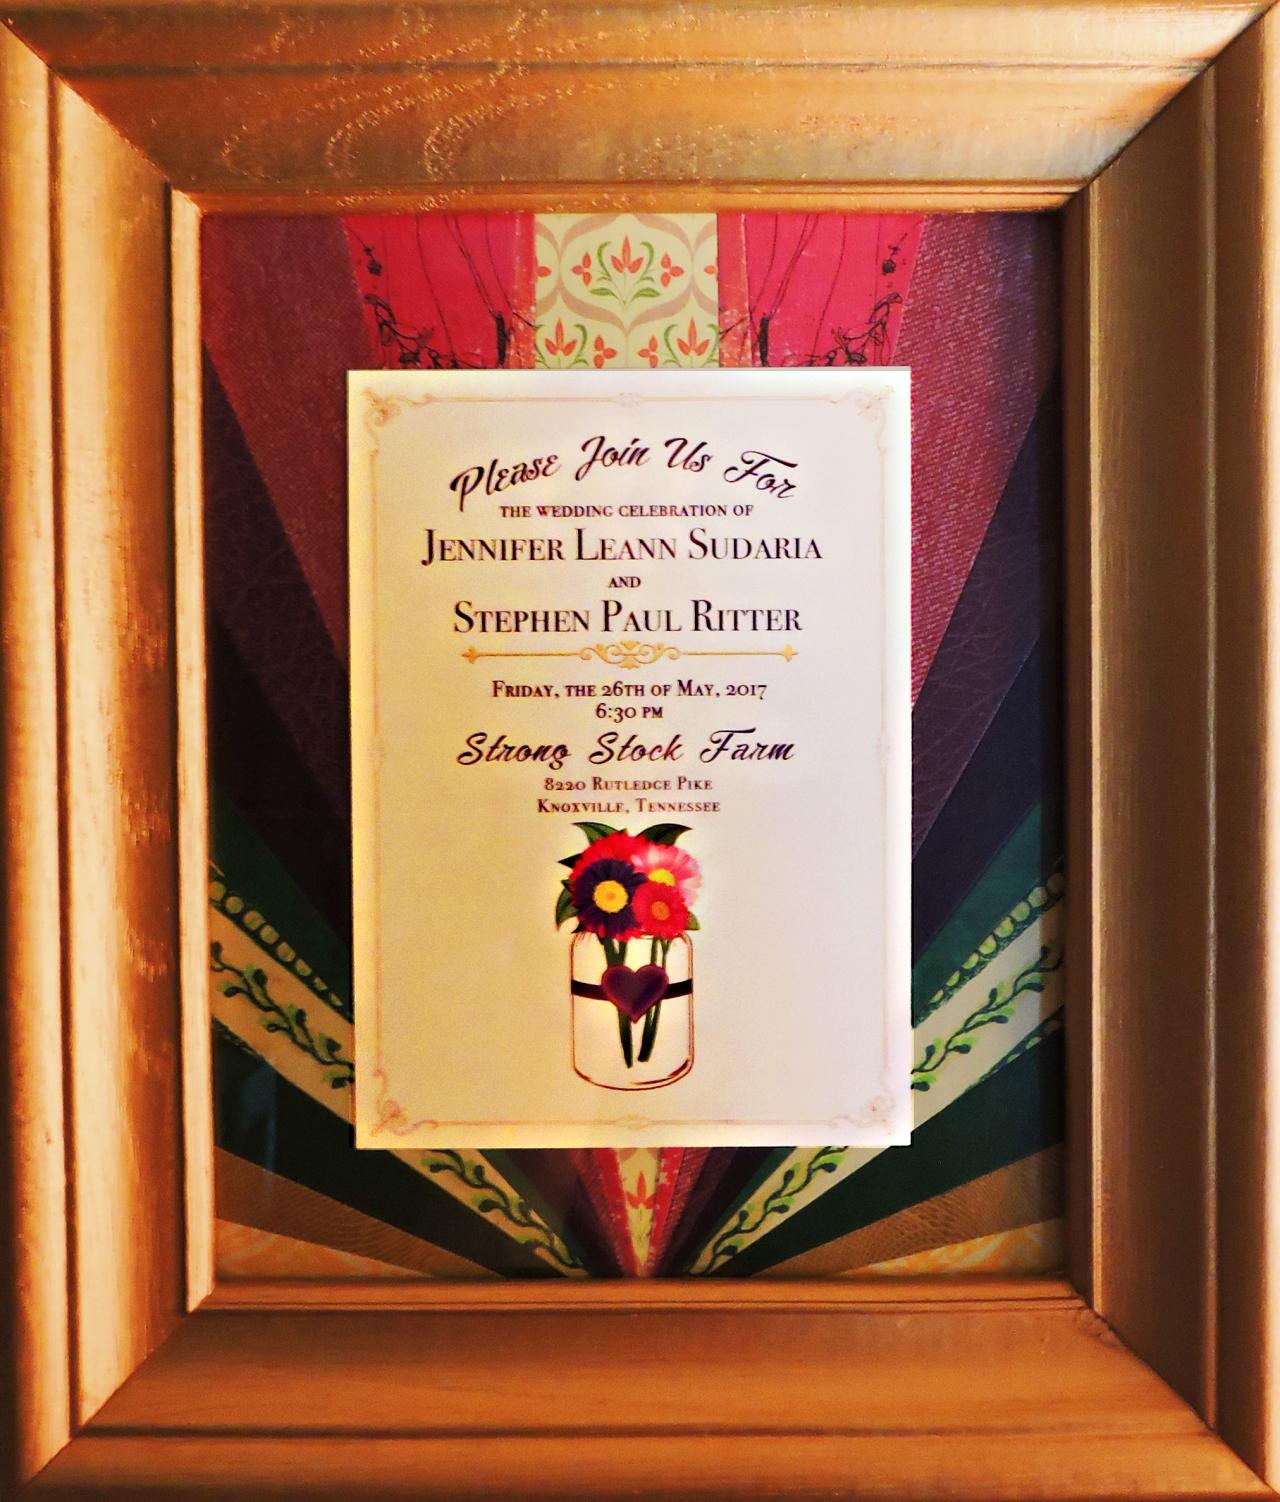 Keepsake plus for jenn and paul emily shane mixed media artist jennifer and pauls wedding invitation stopboris Choice Image